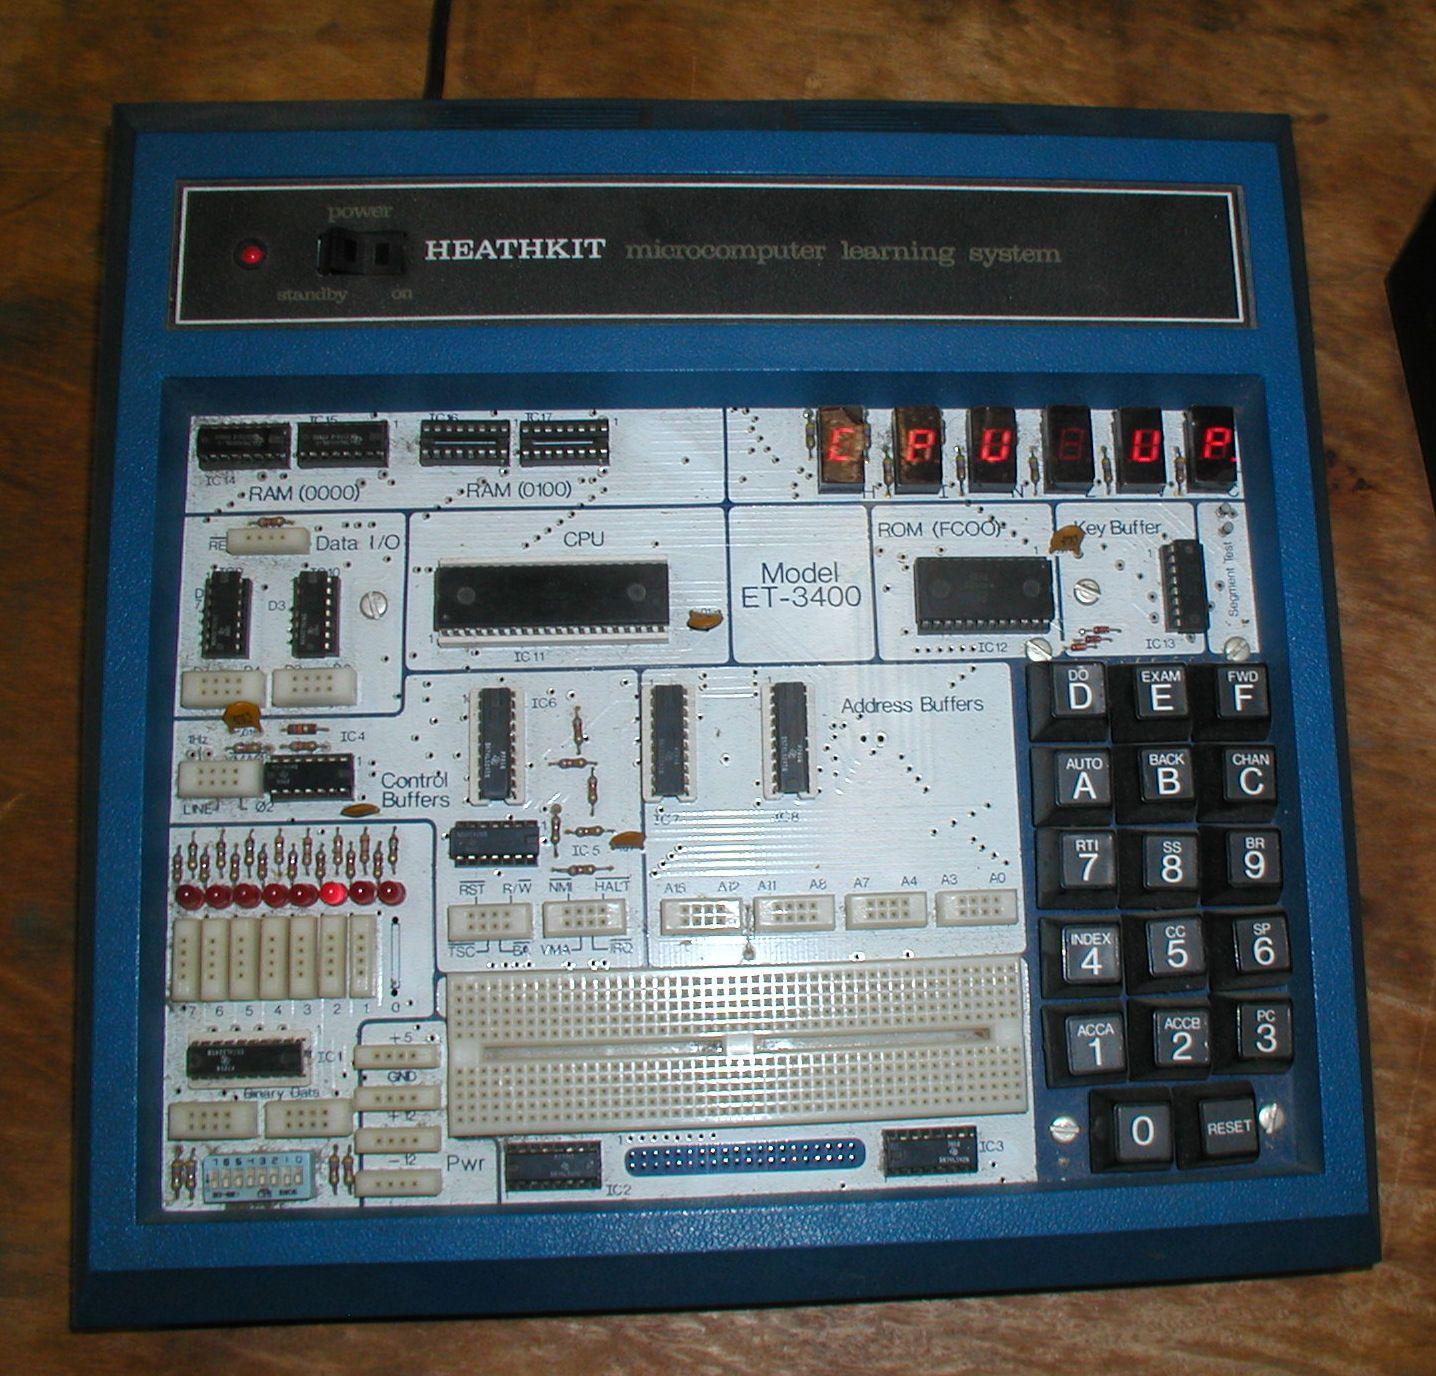 Think, that ham central amateur radio electronics